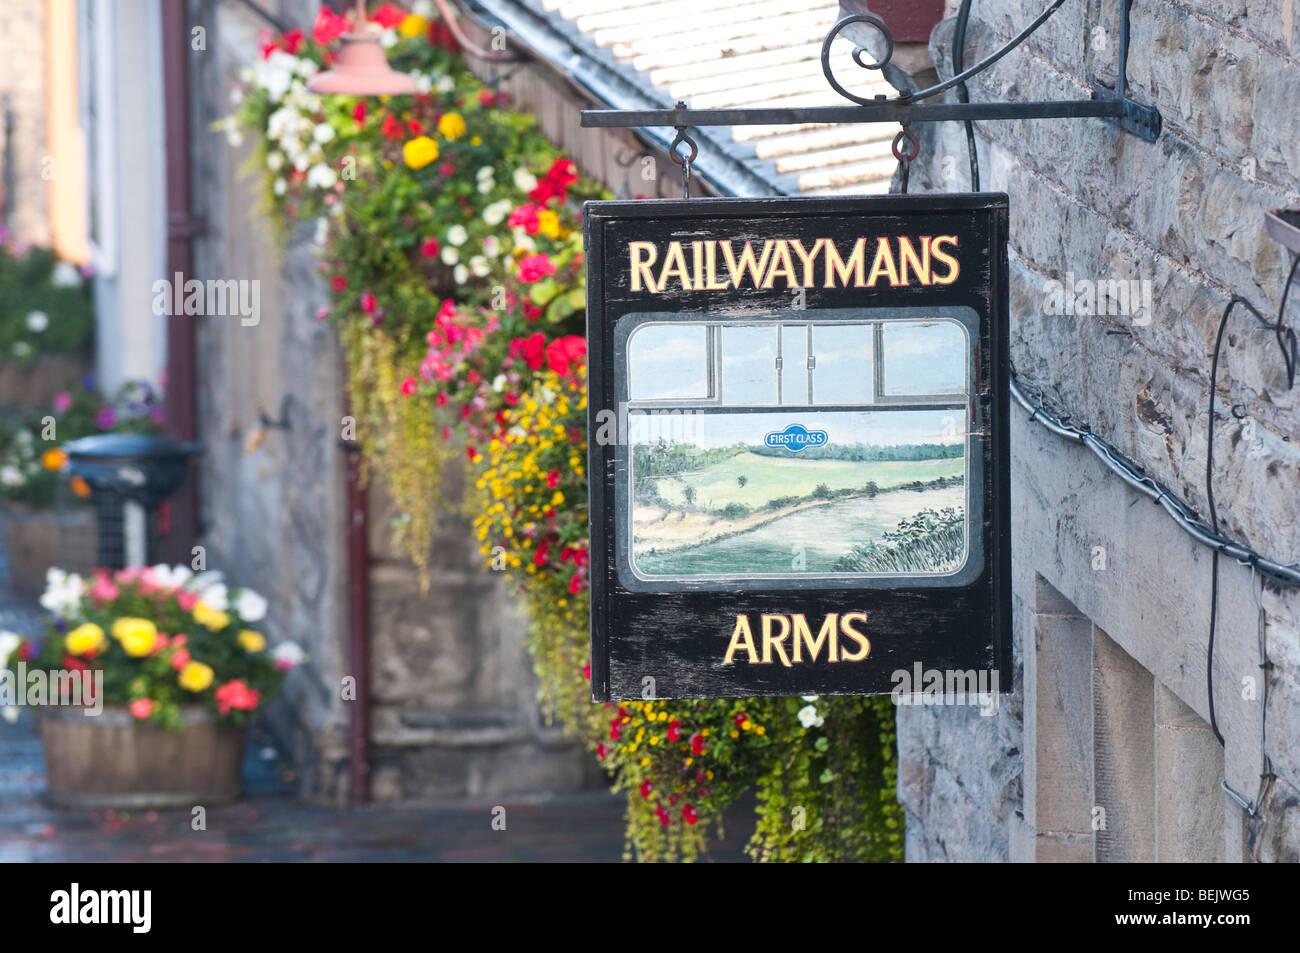 Railwaymans Arms pub sign at Severn Valley Railway station Bridgnorth Shropshire - Stock Image